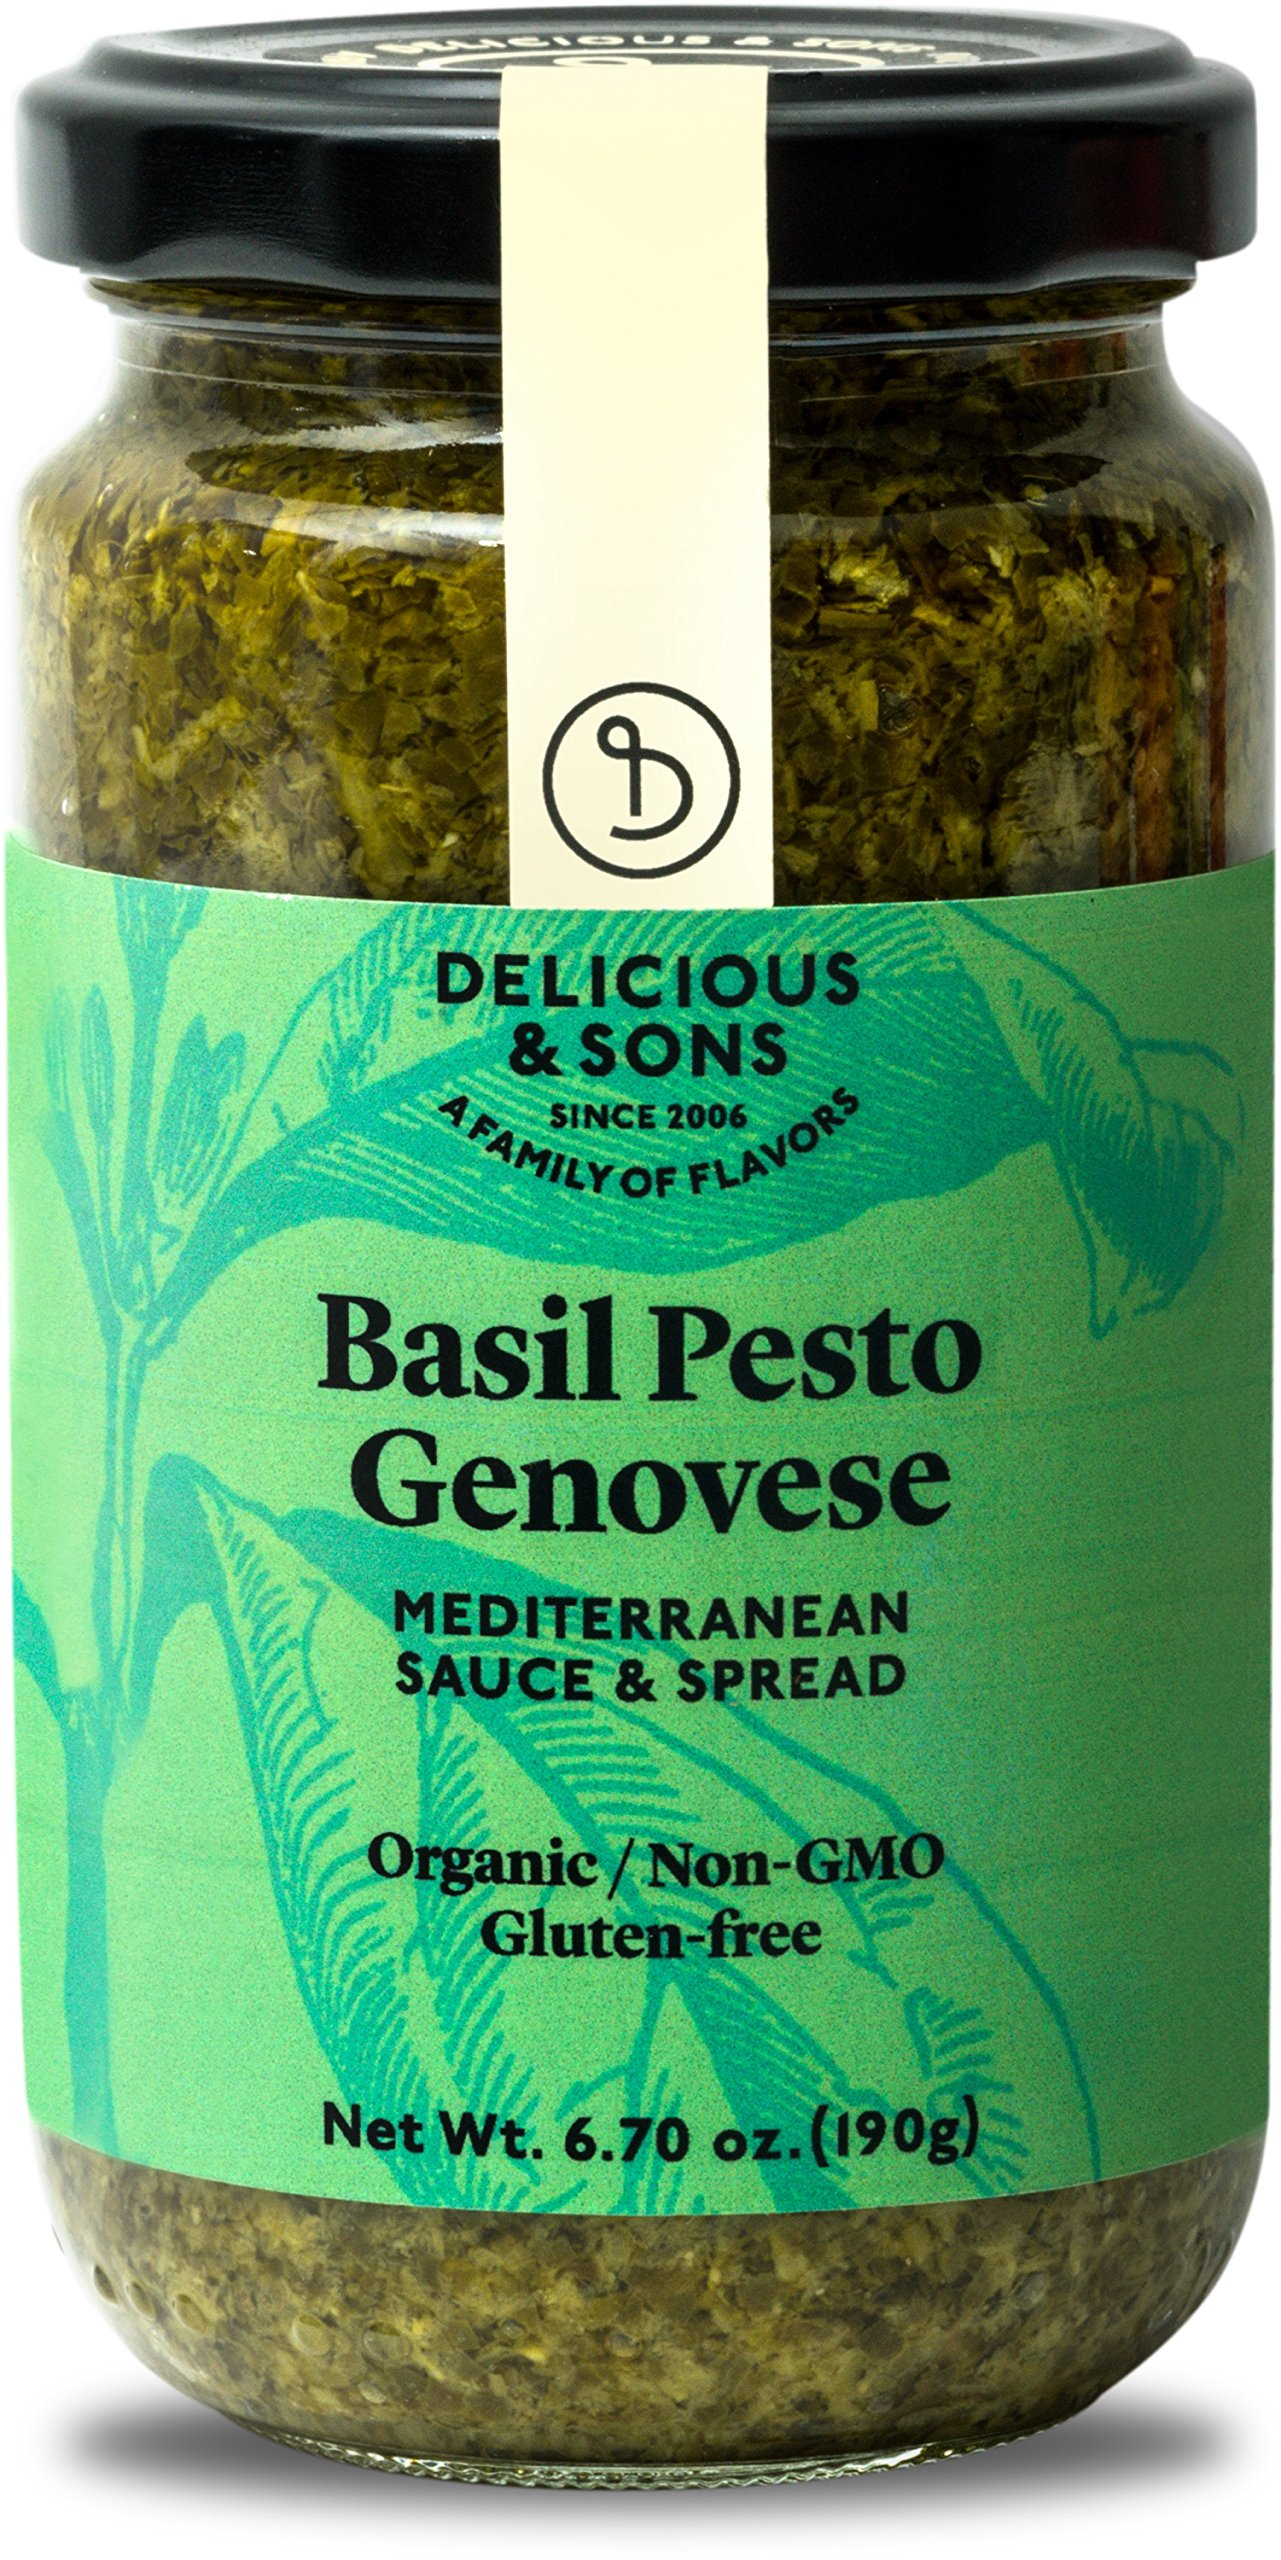 Delicious & Sons Organic Basil Pesto Genovese 6.70 oz.